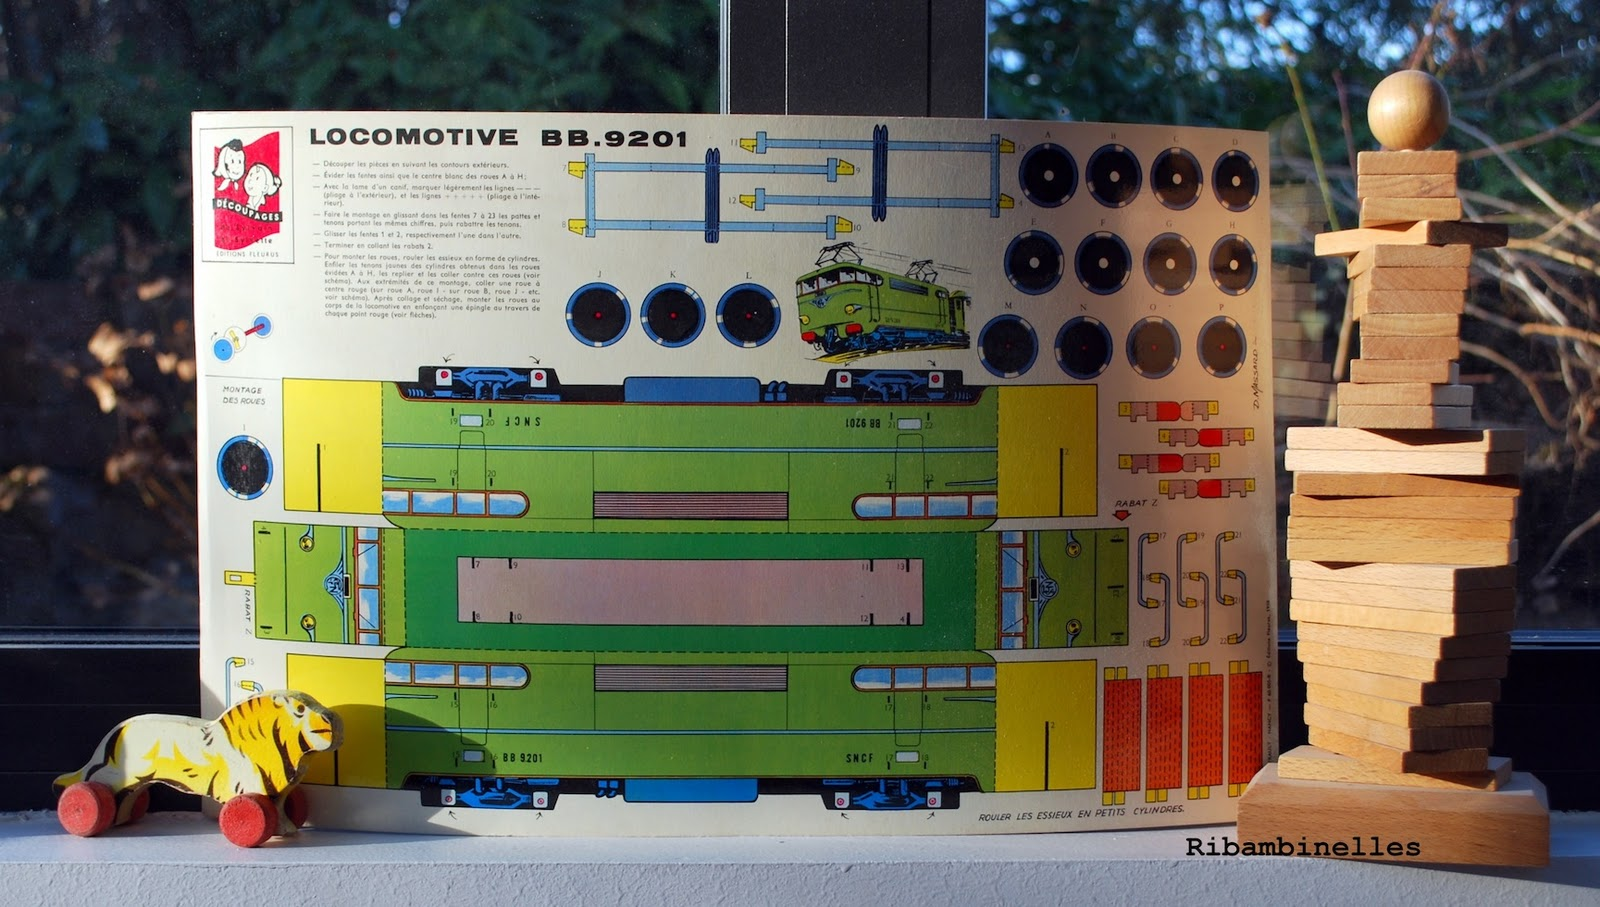 http://1.bp.blogspot.com/-FH9T8uYZ0uw/TxHDVEPg1CI/AAAAAAAAADA/HgadeN2PvPk/s1600/locomotive+BB+9201+SNCF+sylvain+sylvette+de%25CC%2581coupage+paper+toy+fleurus+1959+MASSARD+2+.jpg